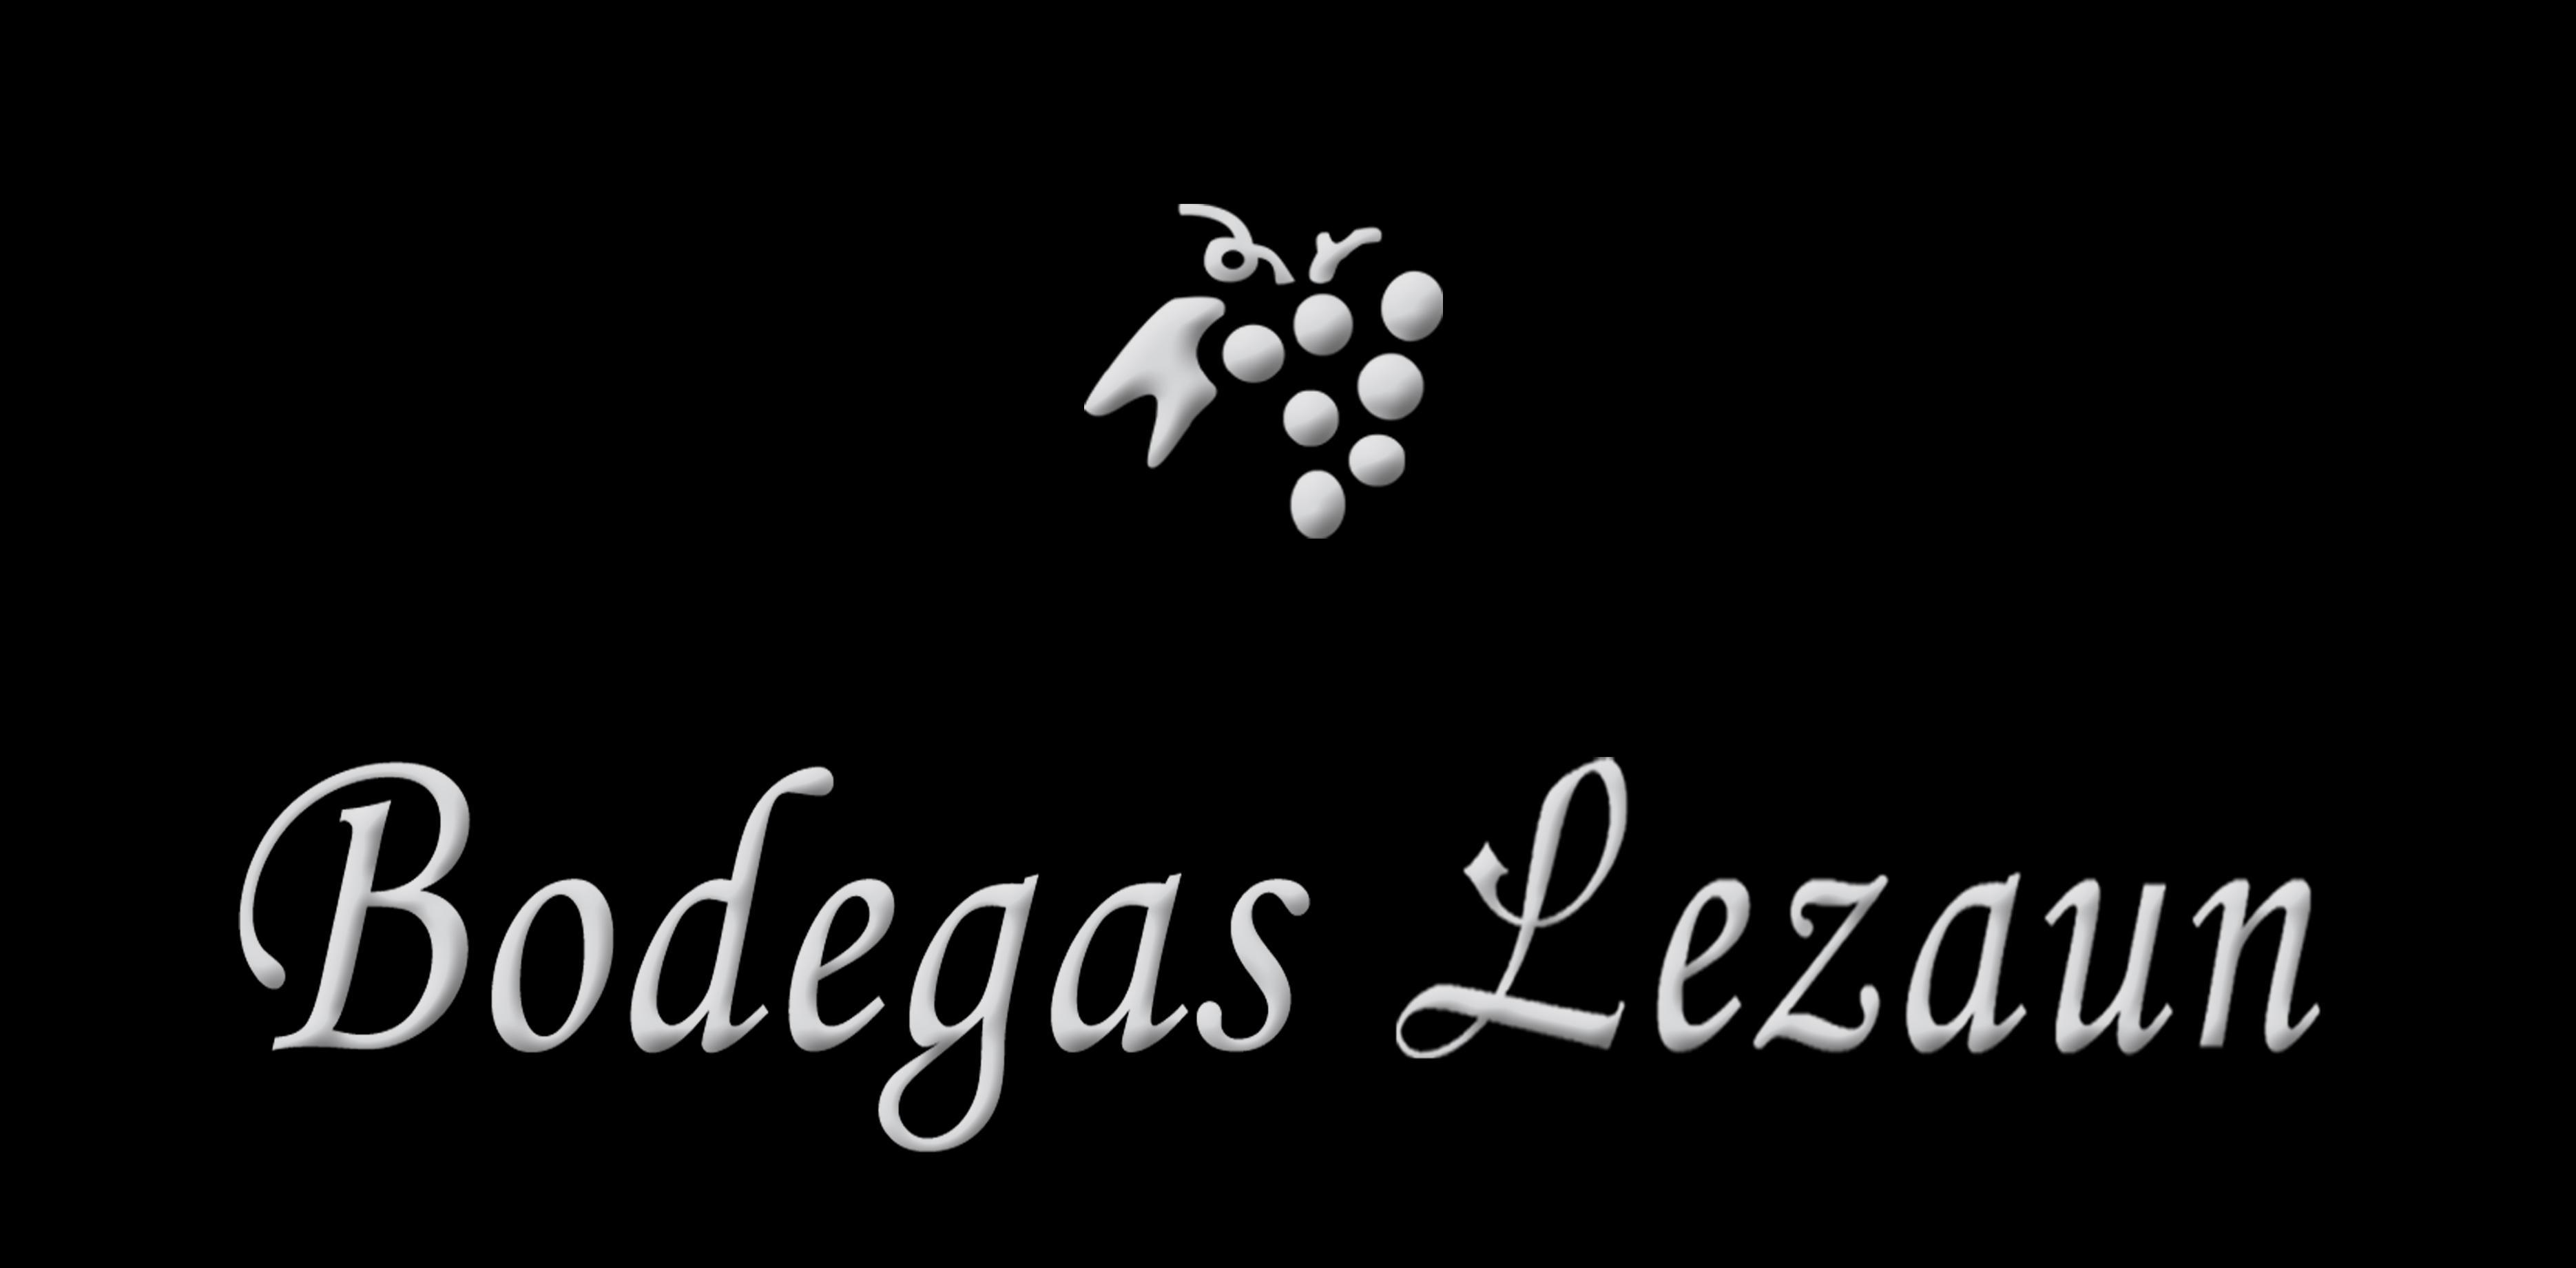 Bodegas Lezaun